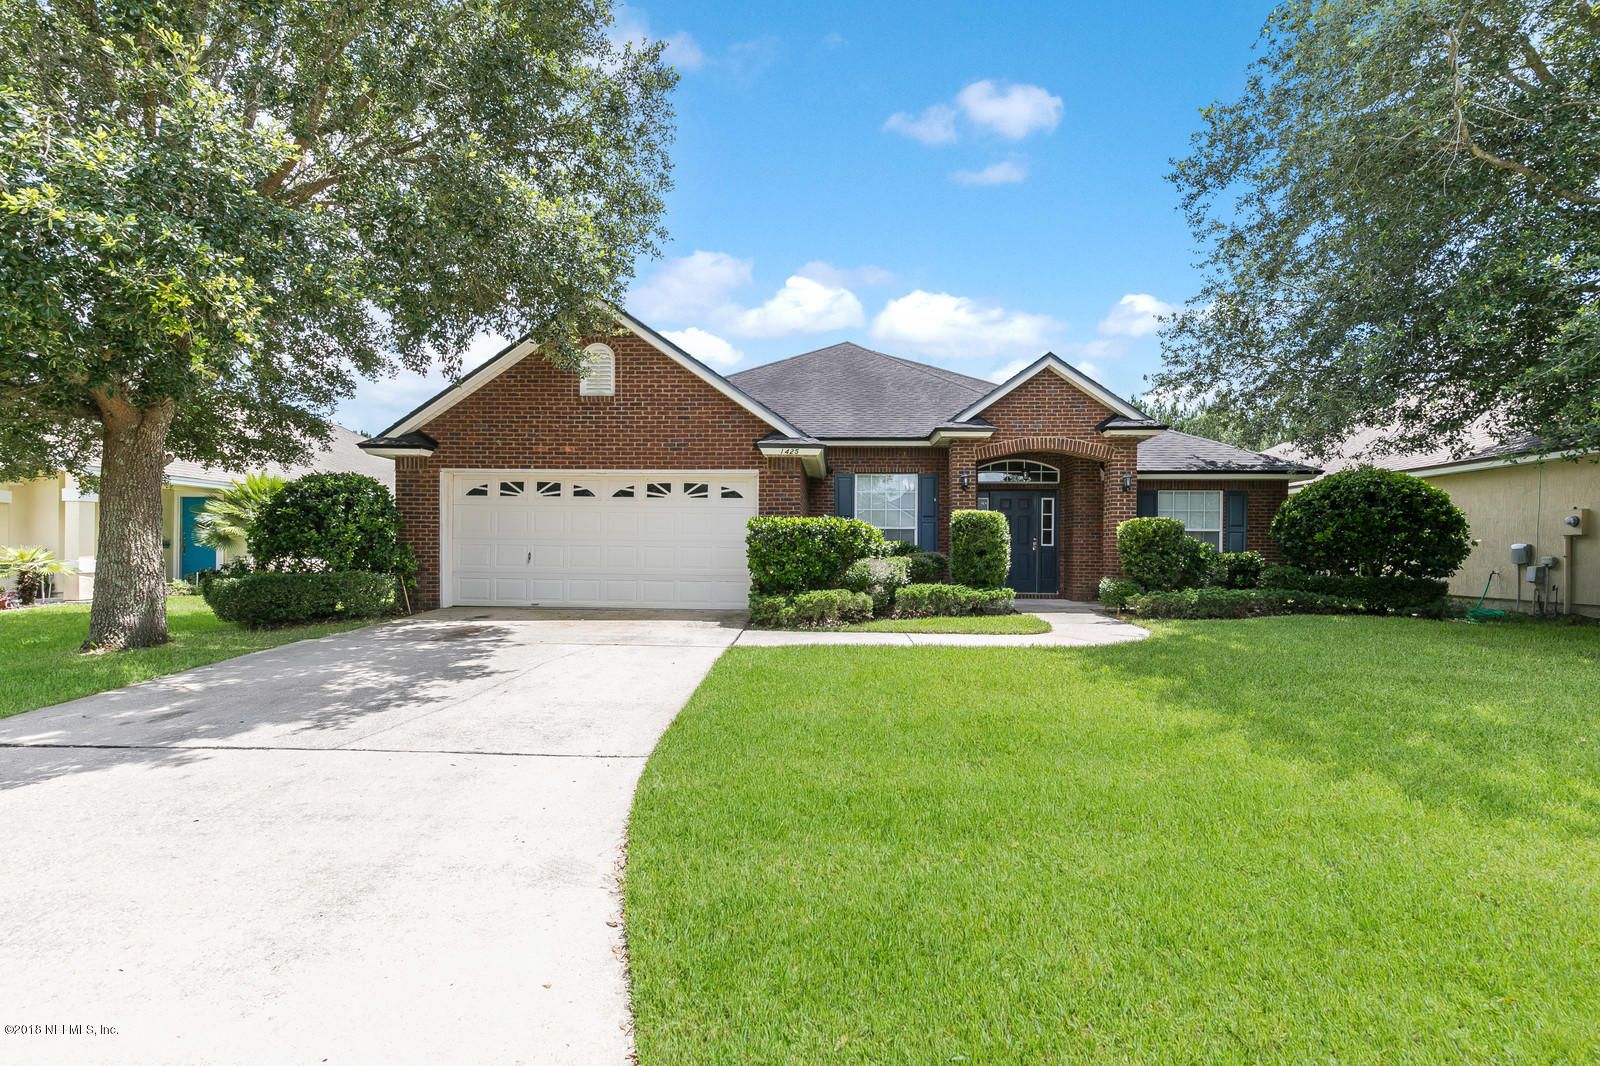 1425 CANOPY OAKS, ORANGE PARK, FLORIDA 32065, 4 Bedrooms Bedrooms, ,3 BathroomsBathrooms,Residential - single family,For sale,CANOPY OAKS,942325